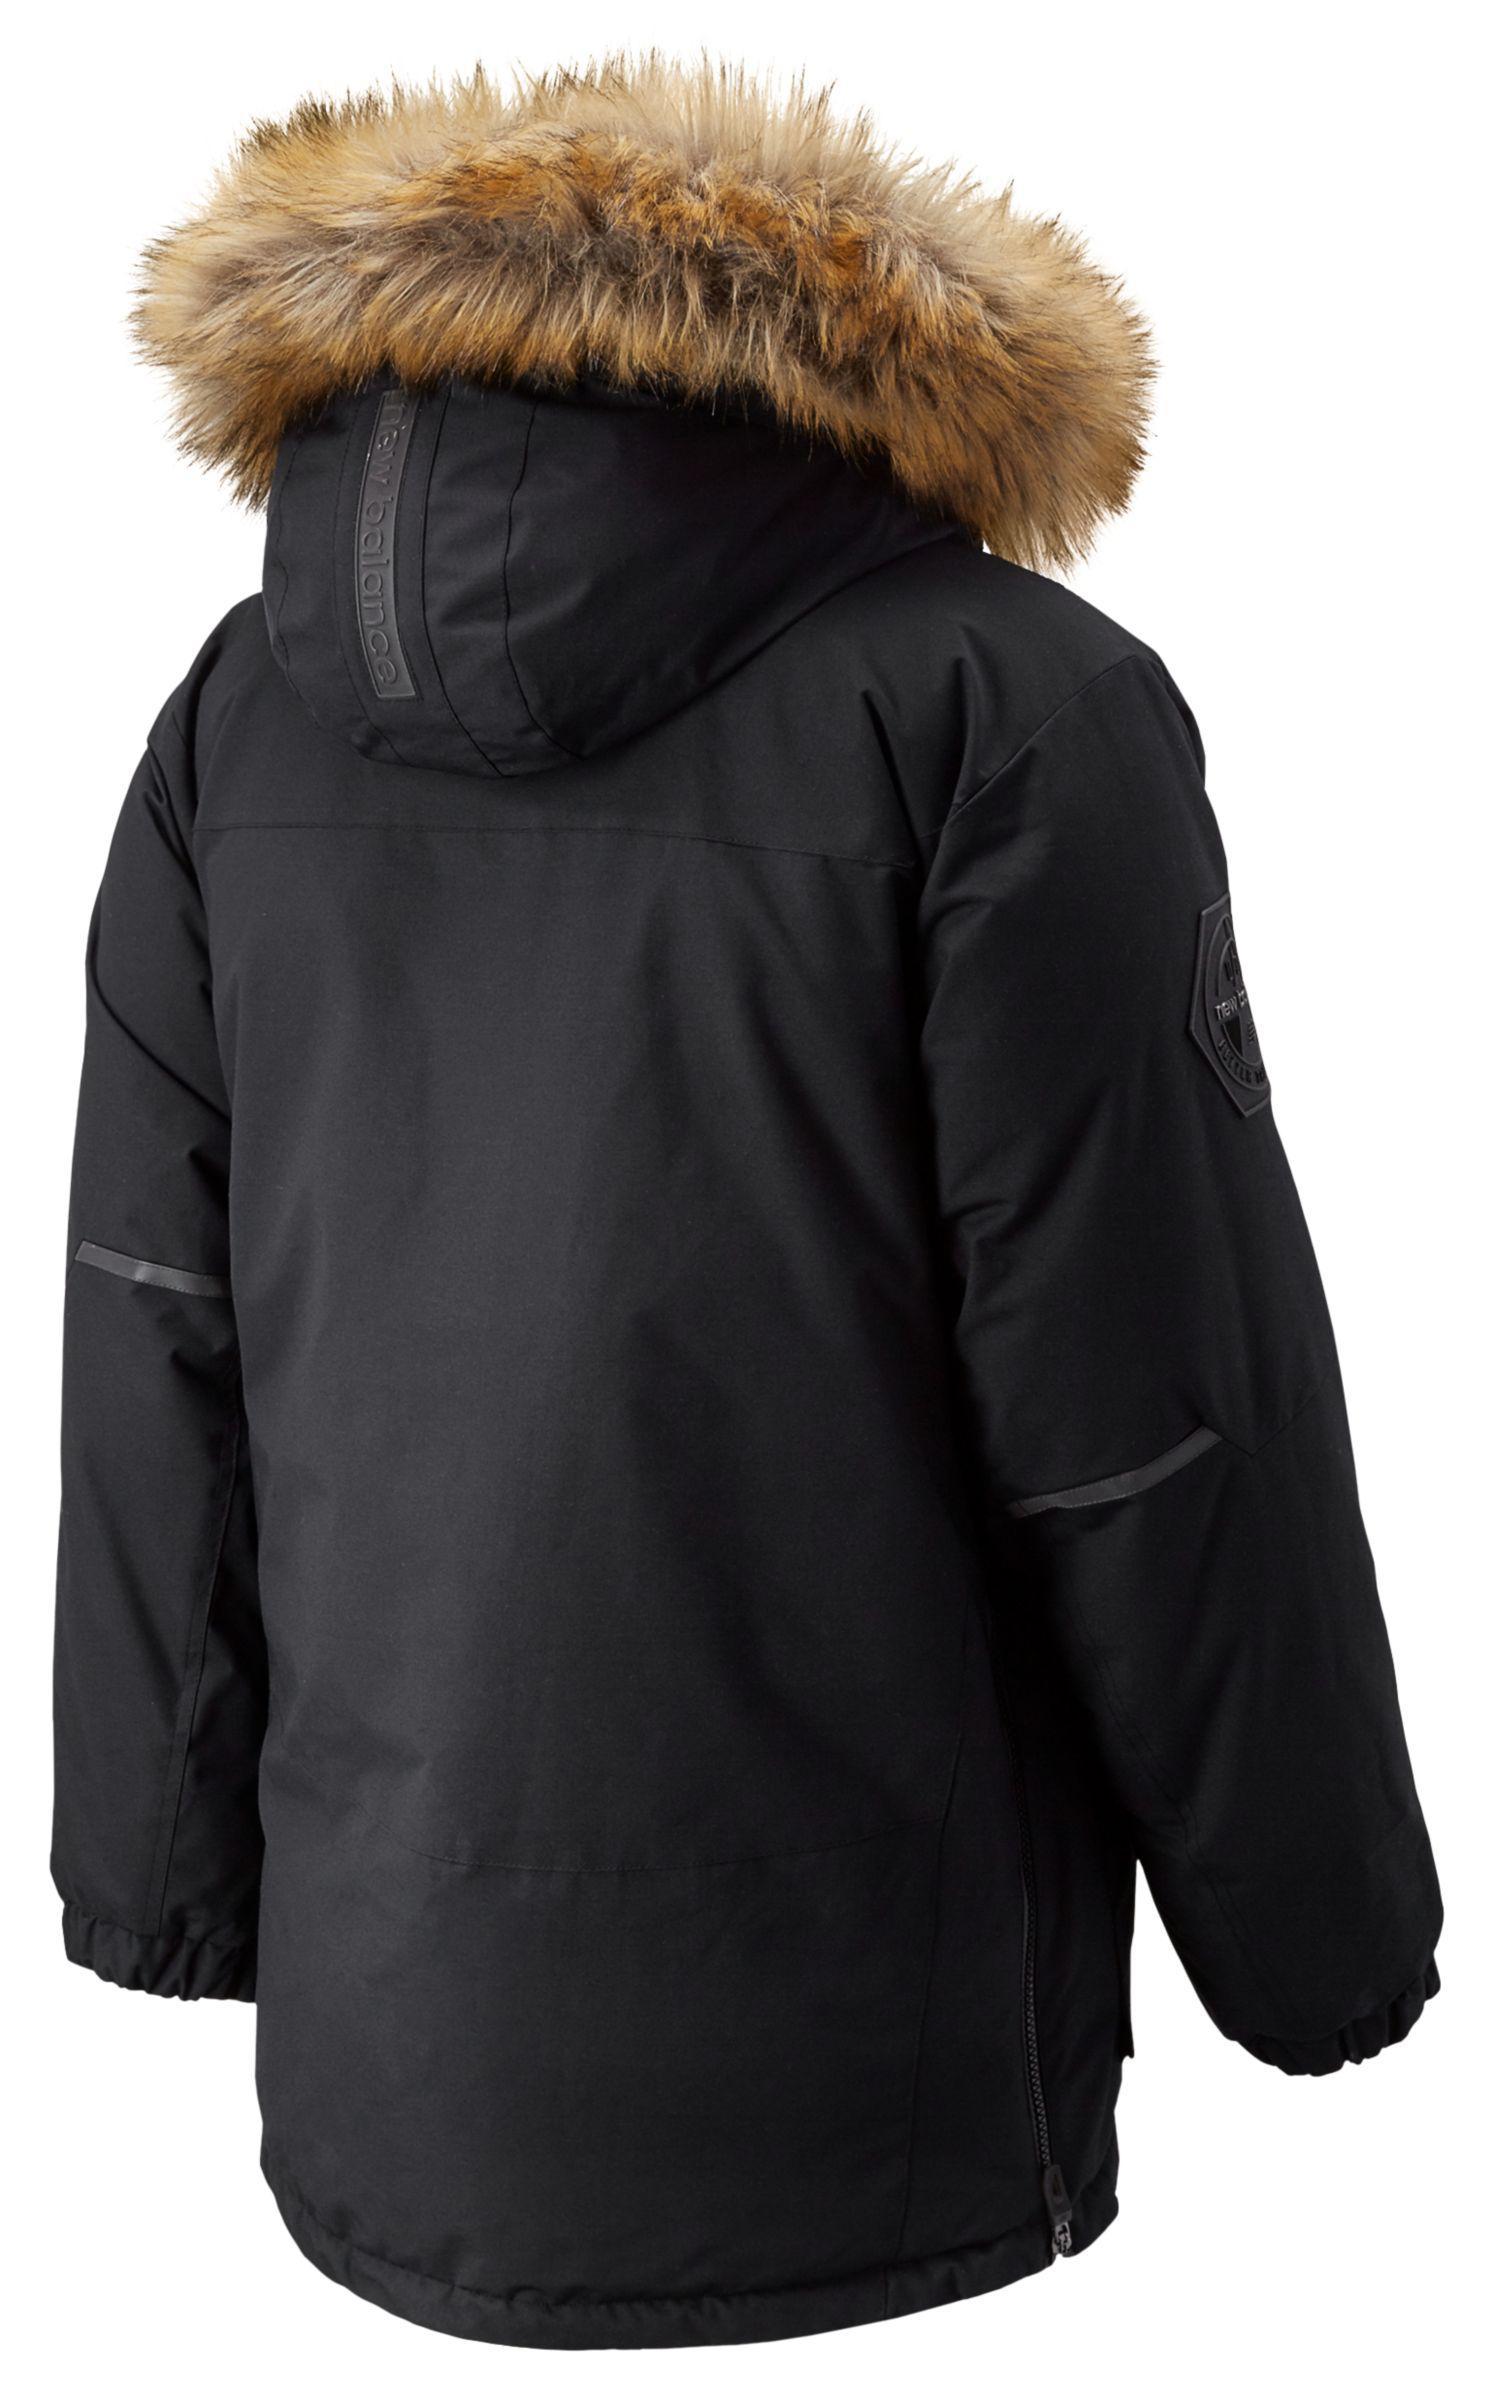 Lyst New Balance Patrol Down Jacket In Black For Men